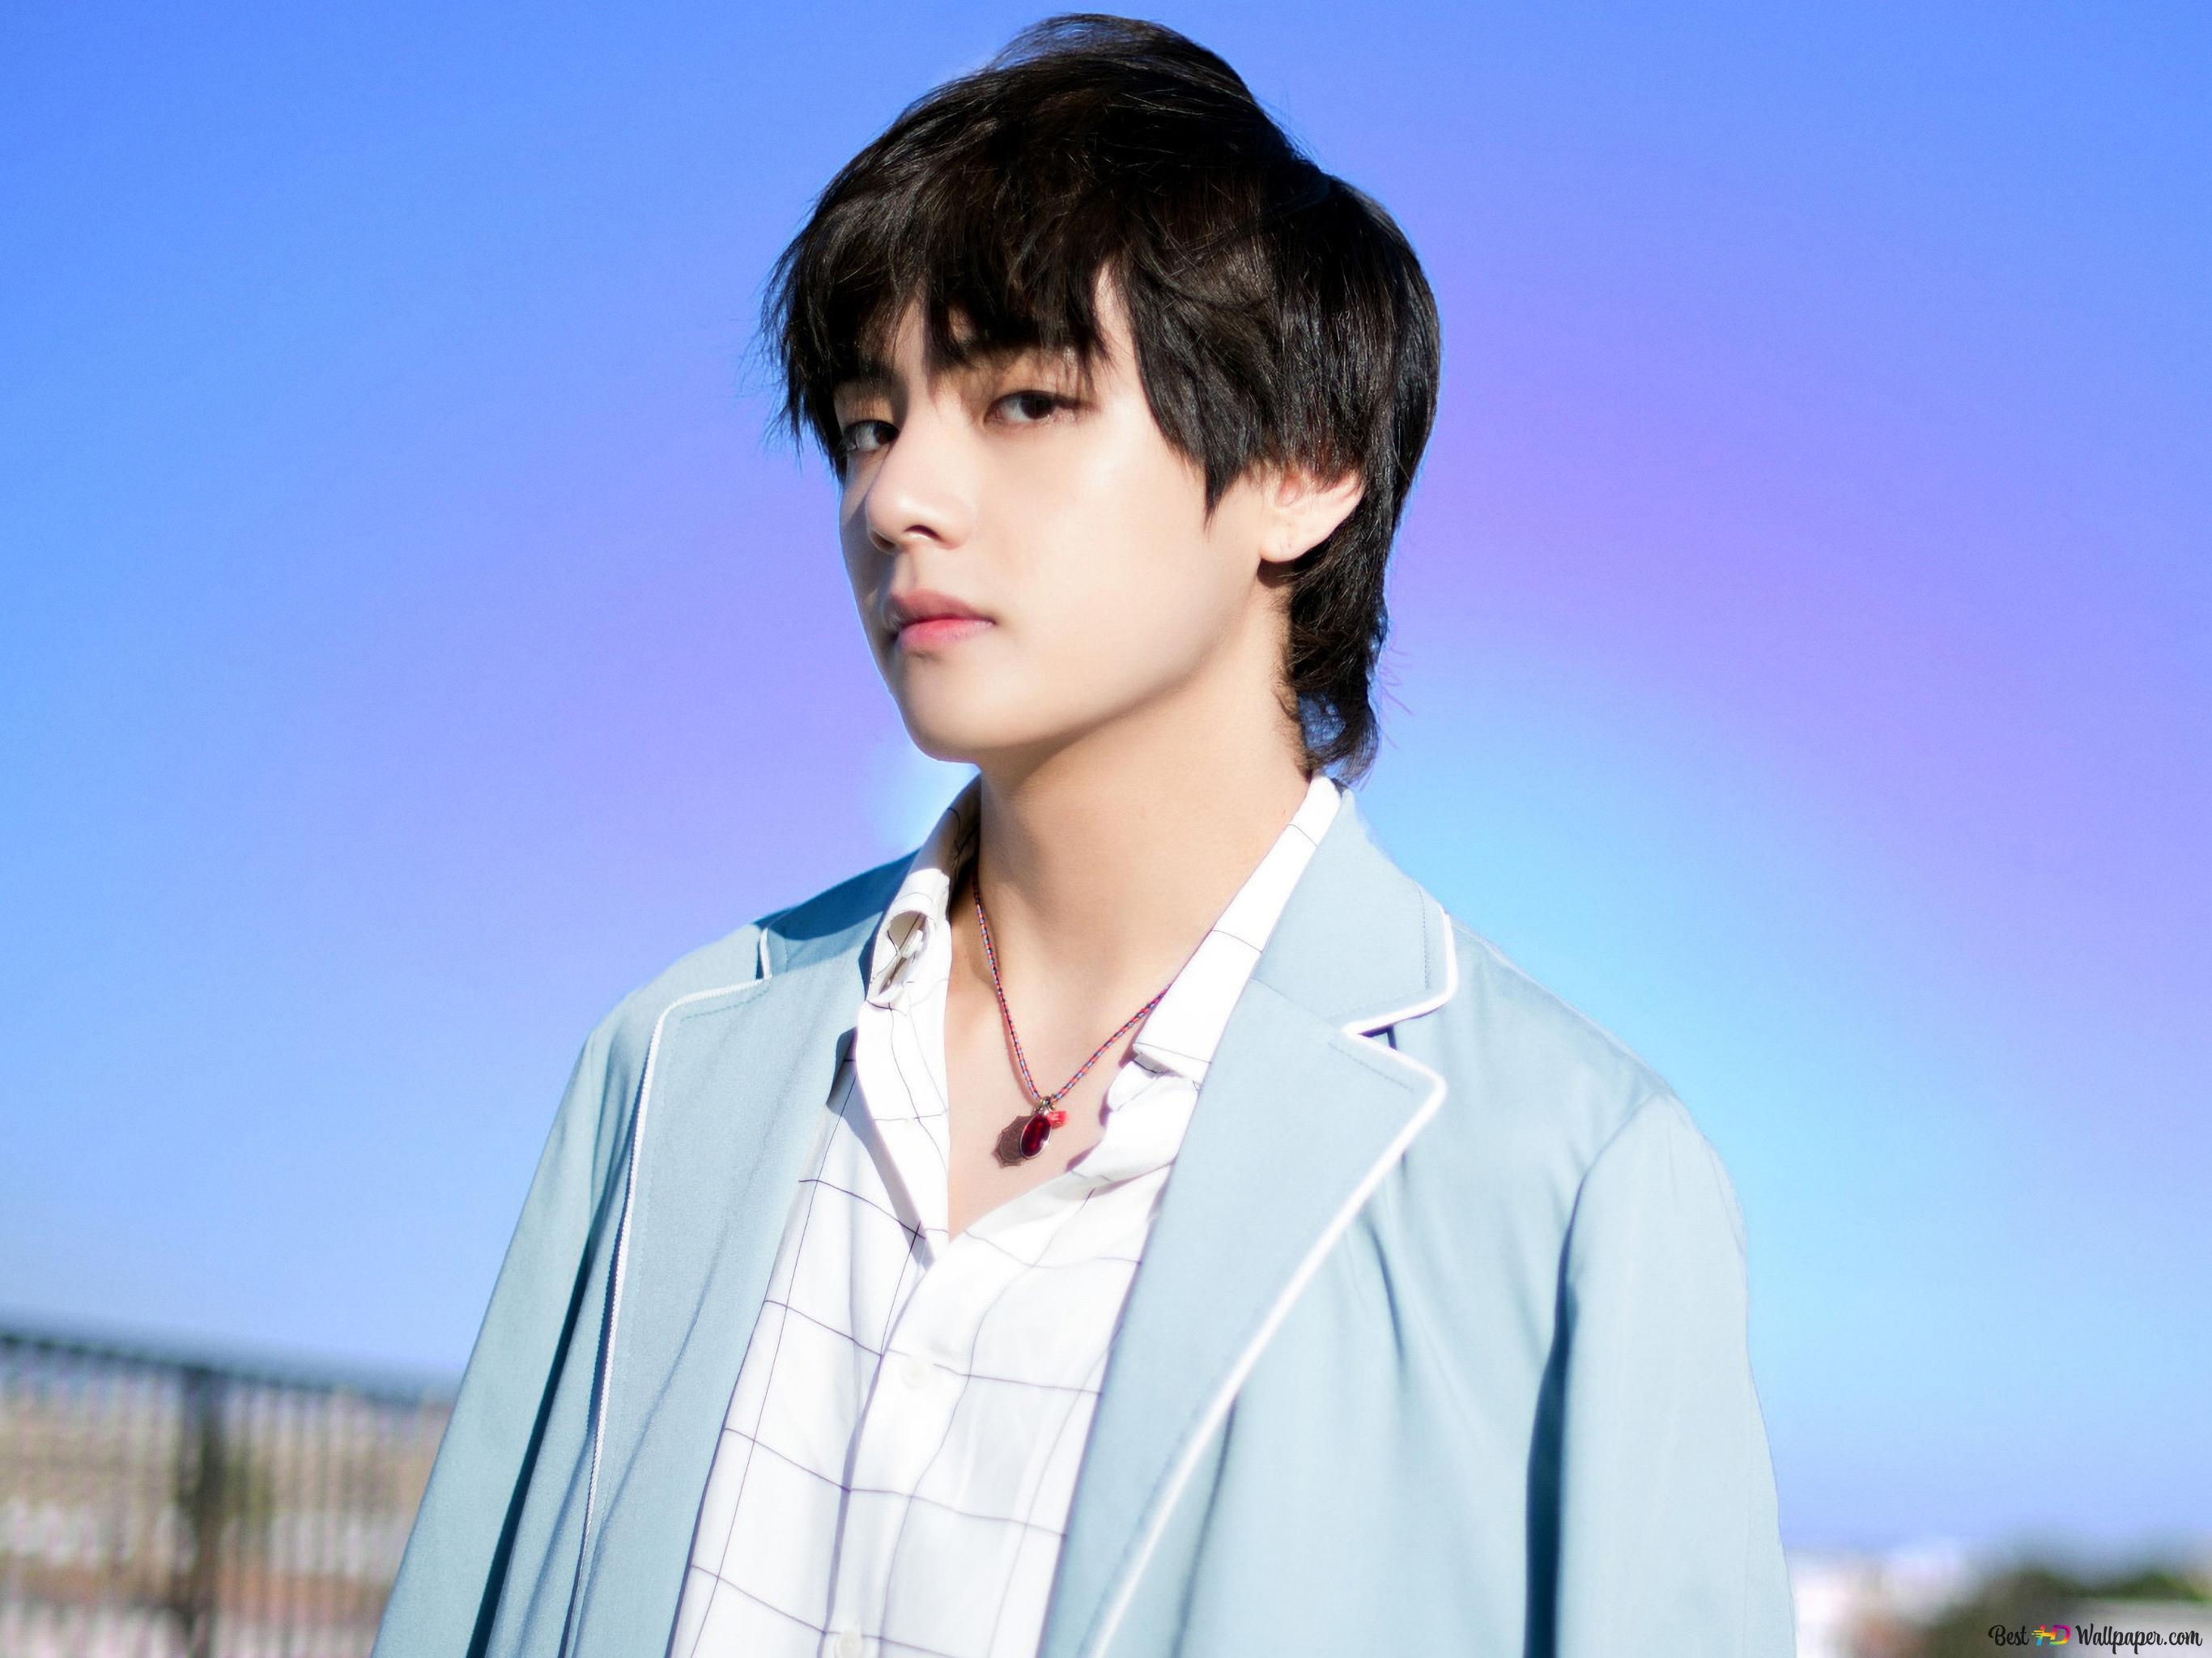 k pop group bts idol v kim tae hyung wallpaper 2732x2048 53645 172